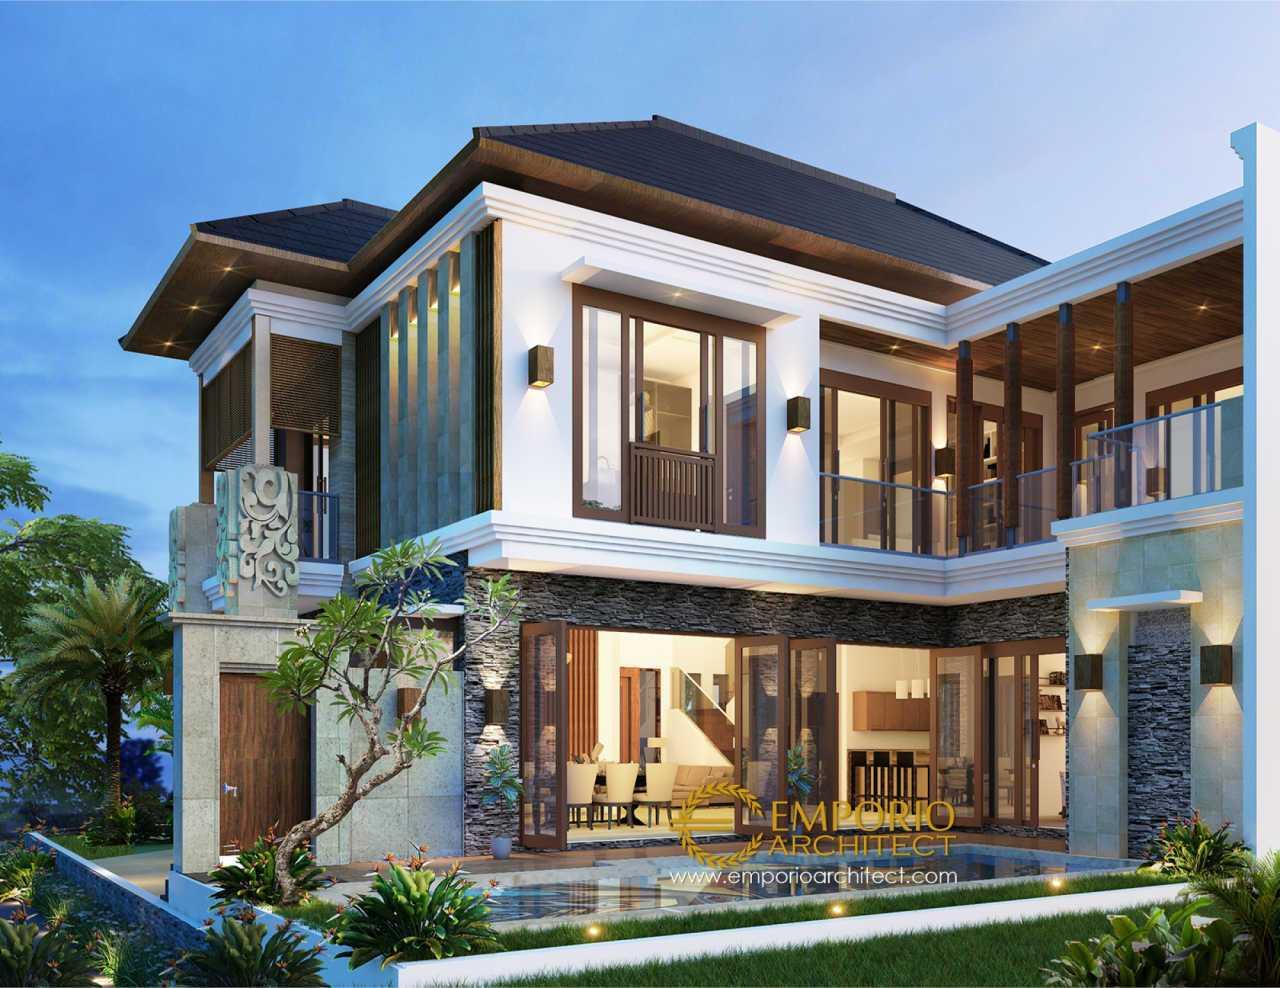 Emporio Architect Jasa Arsitek Bekasi Desain Rumah Villa Bali 2 Lantai 390 @ Bekasi Bekasi, Kota Bks, Jawa Barat, Indonesia Bekasi, Kota Bks, Jawa Barat, Indonesia Emporio-Architect-Jasa-Arsitek-Bekasi-Desain-Rumah-Villa-Bali-2-Lantai-390-Bekasi  91091